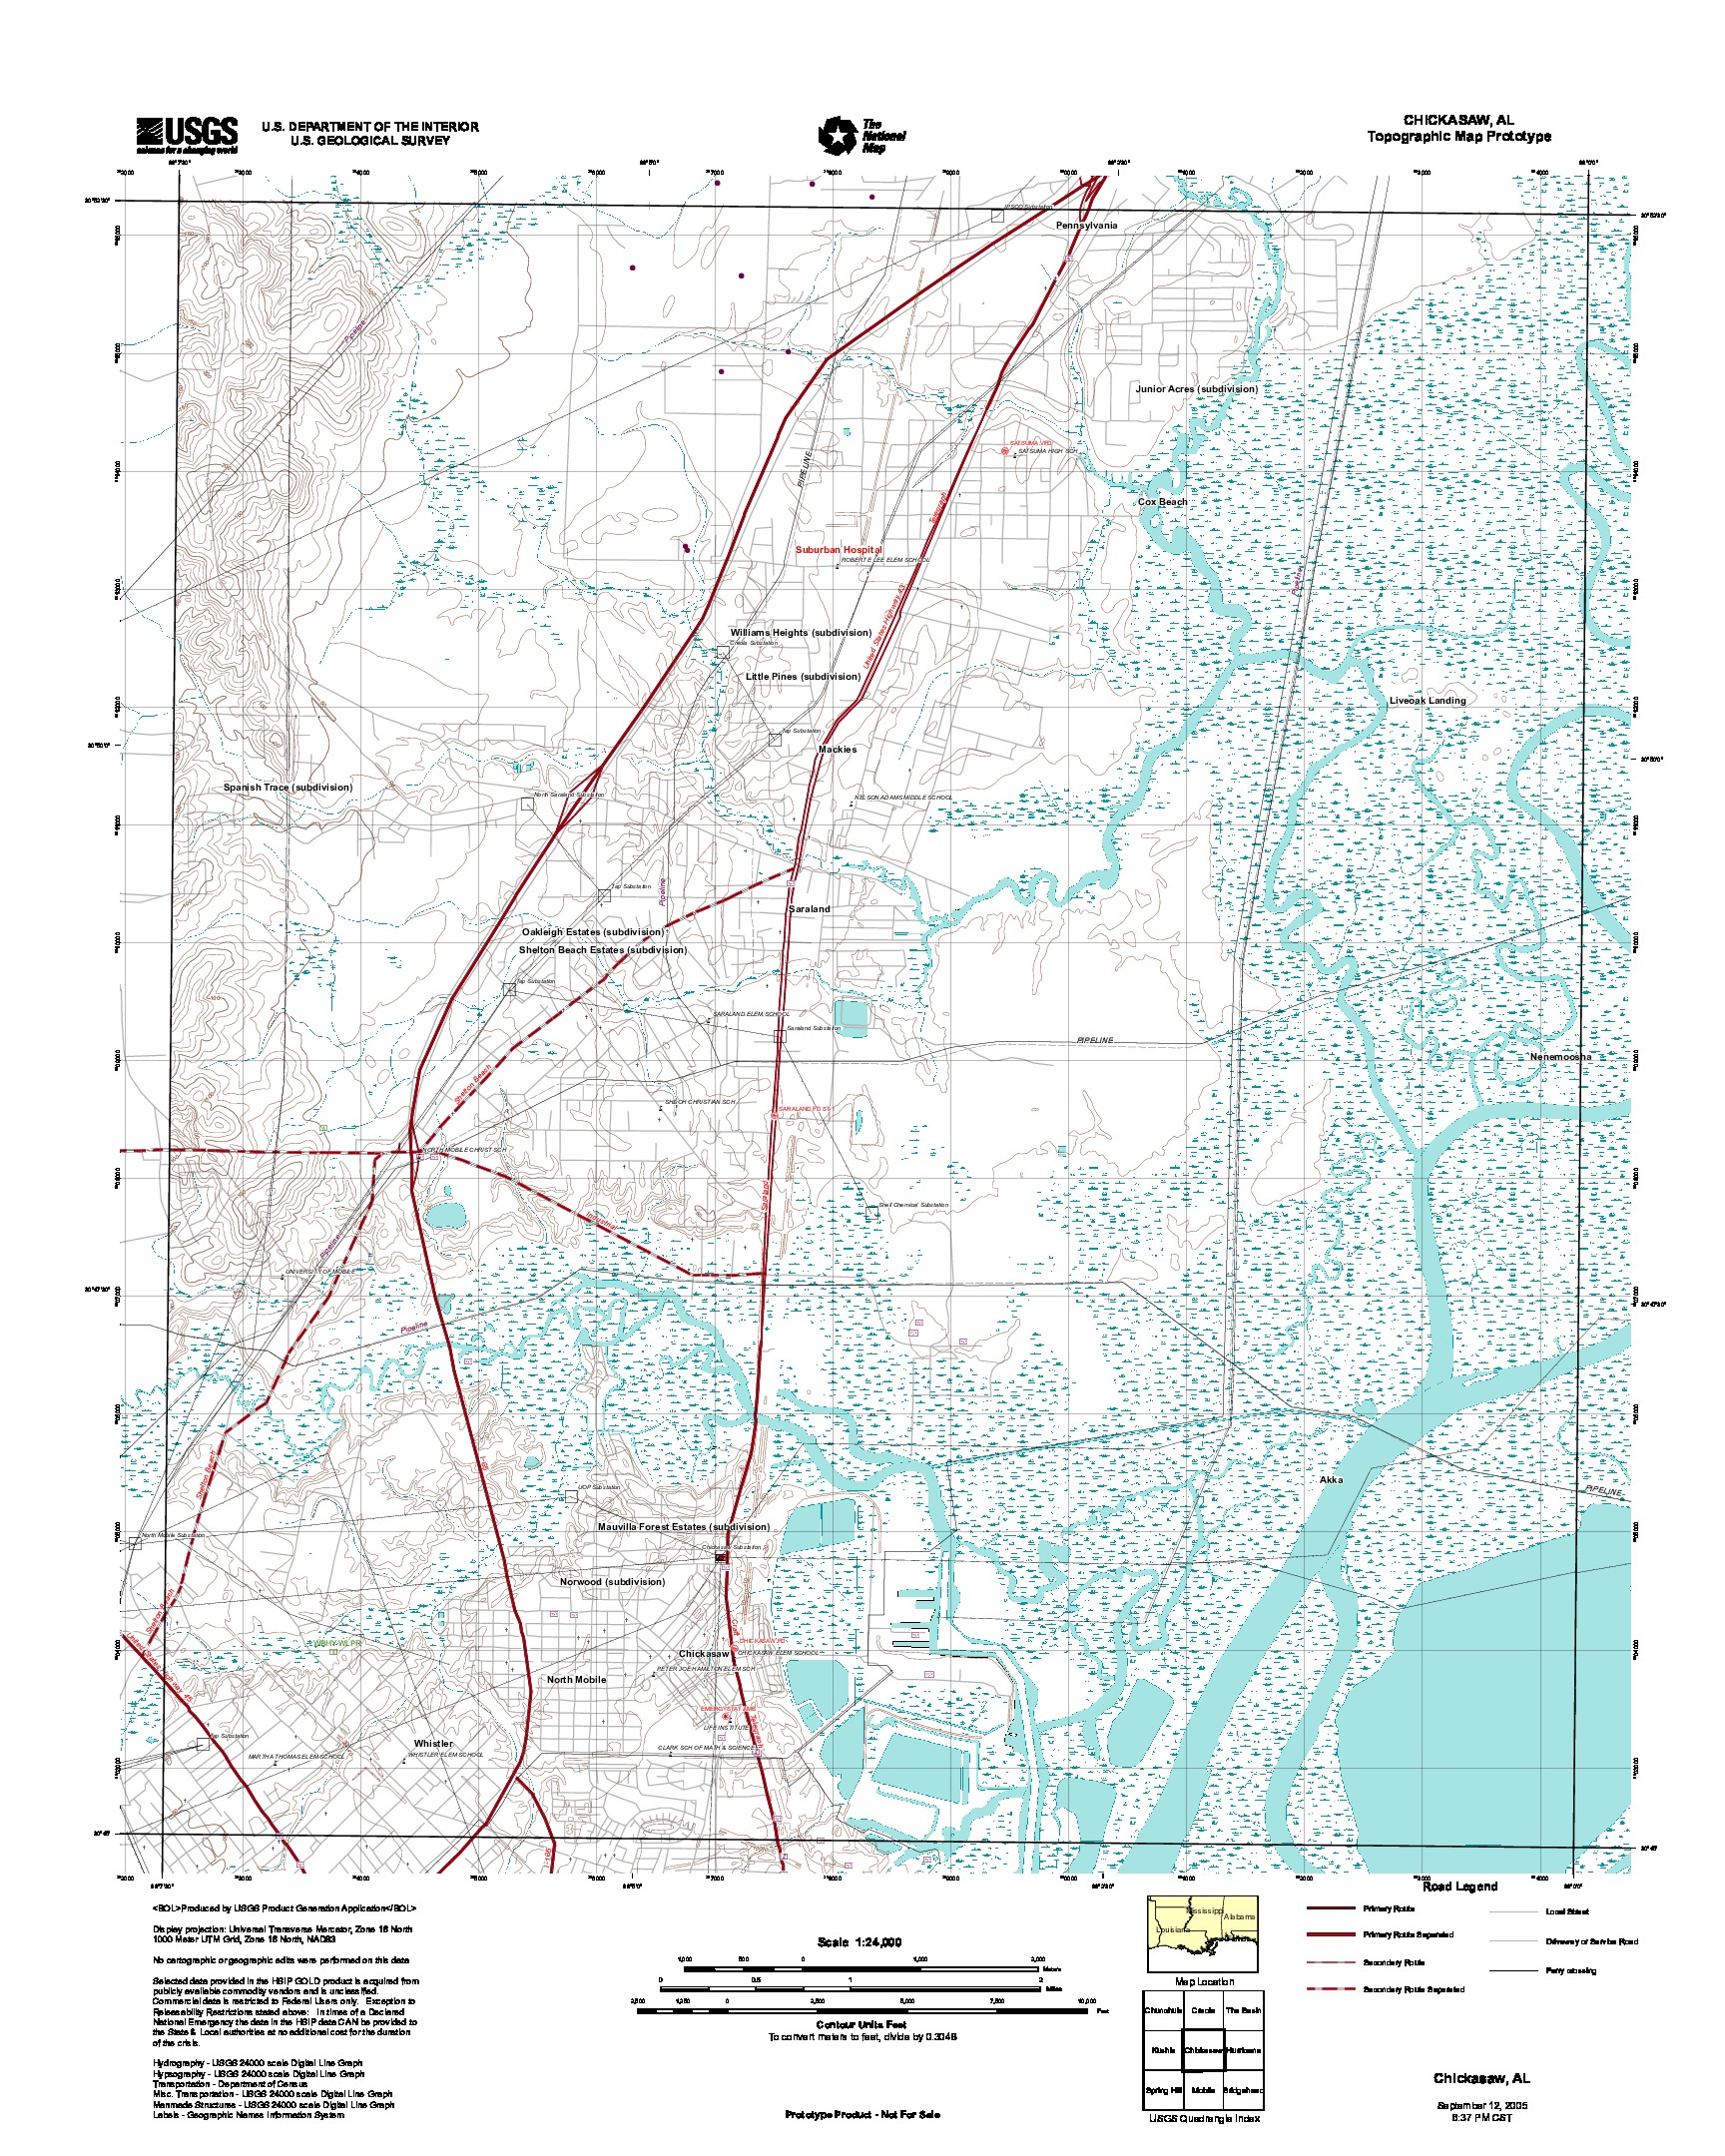 Chickasaw, Topographic Map Prototype, Alabama, United States, September 12, 2005